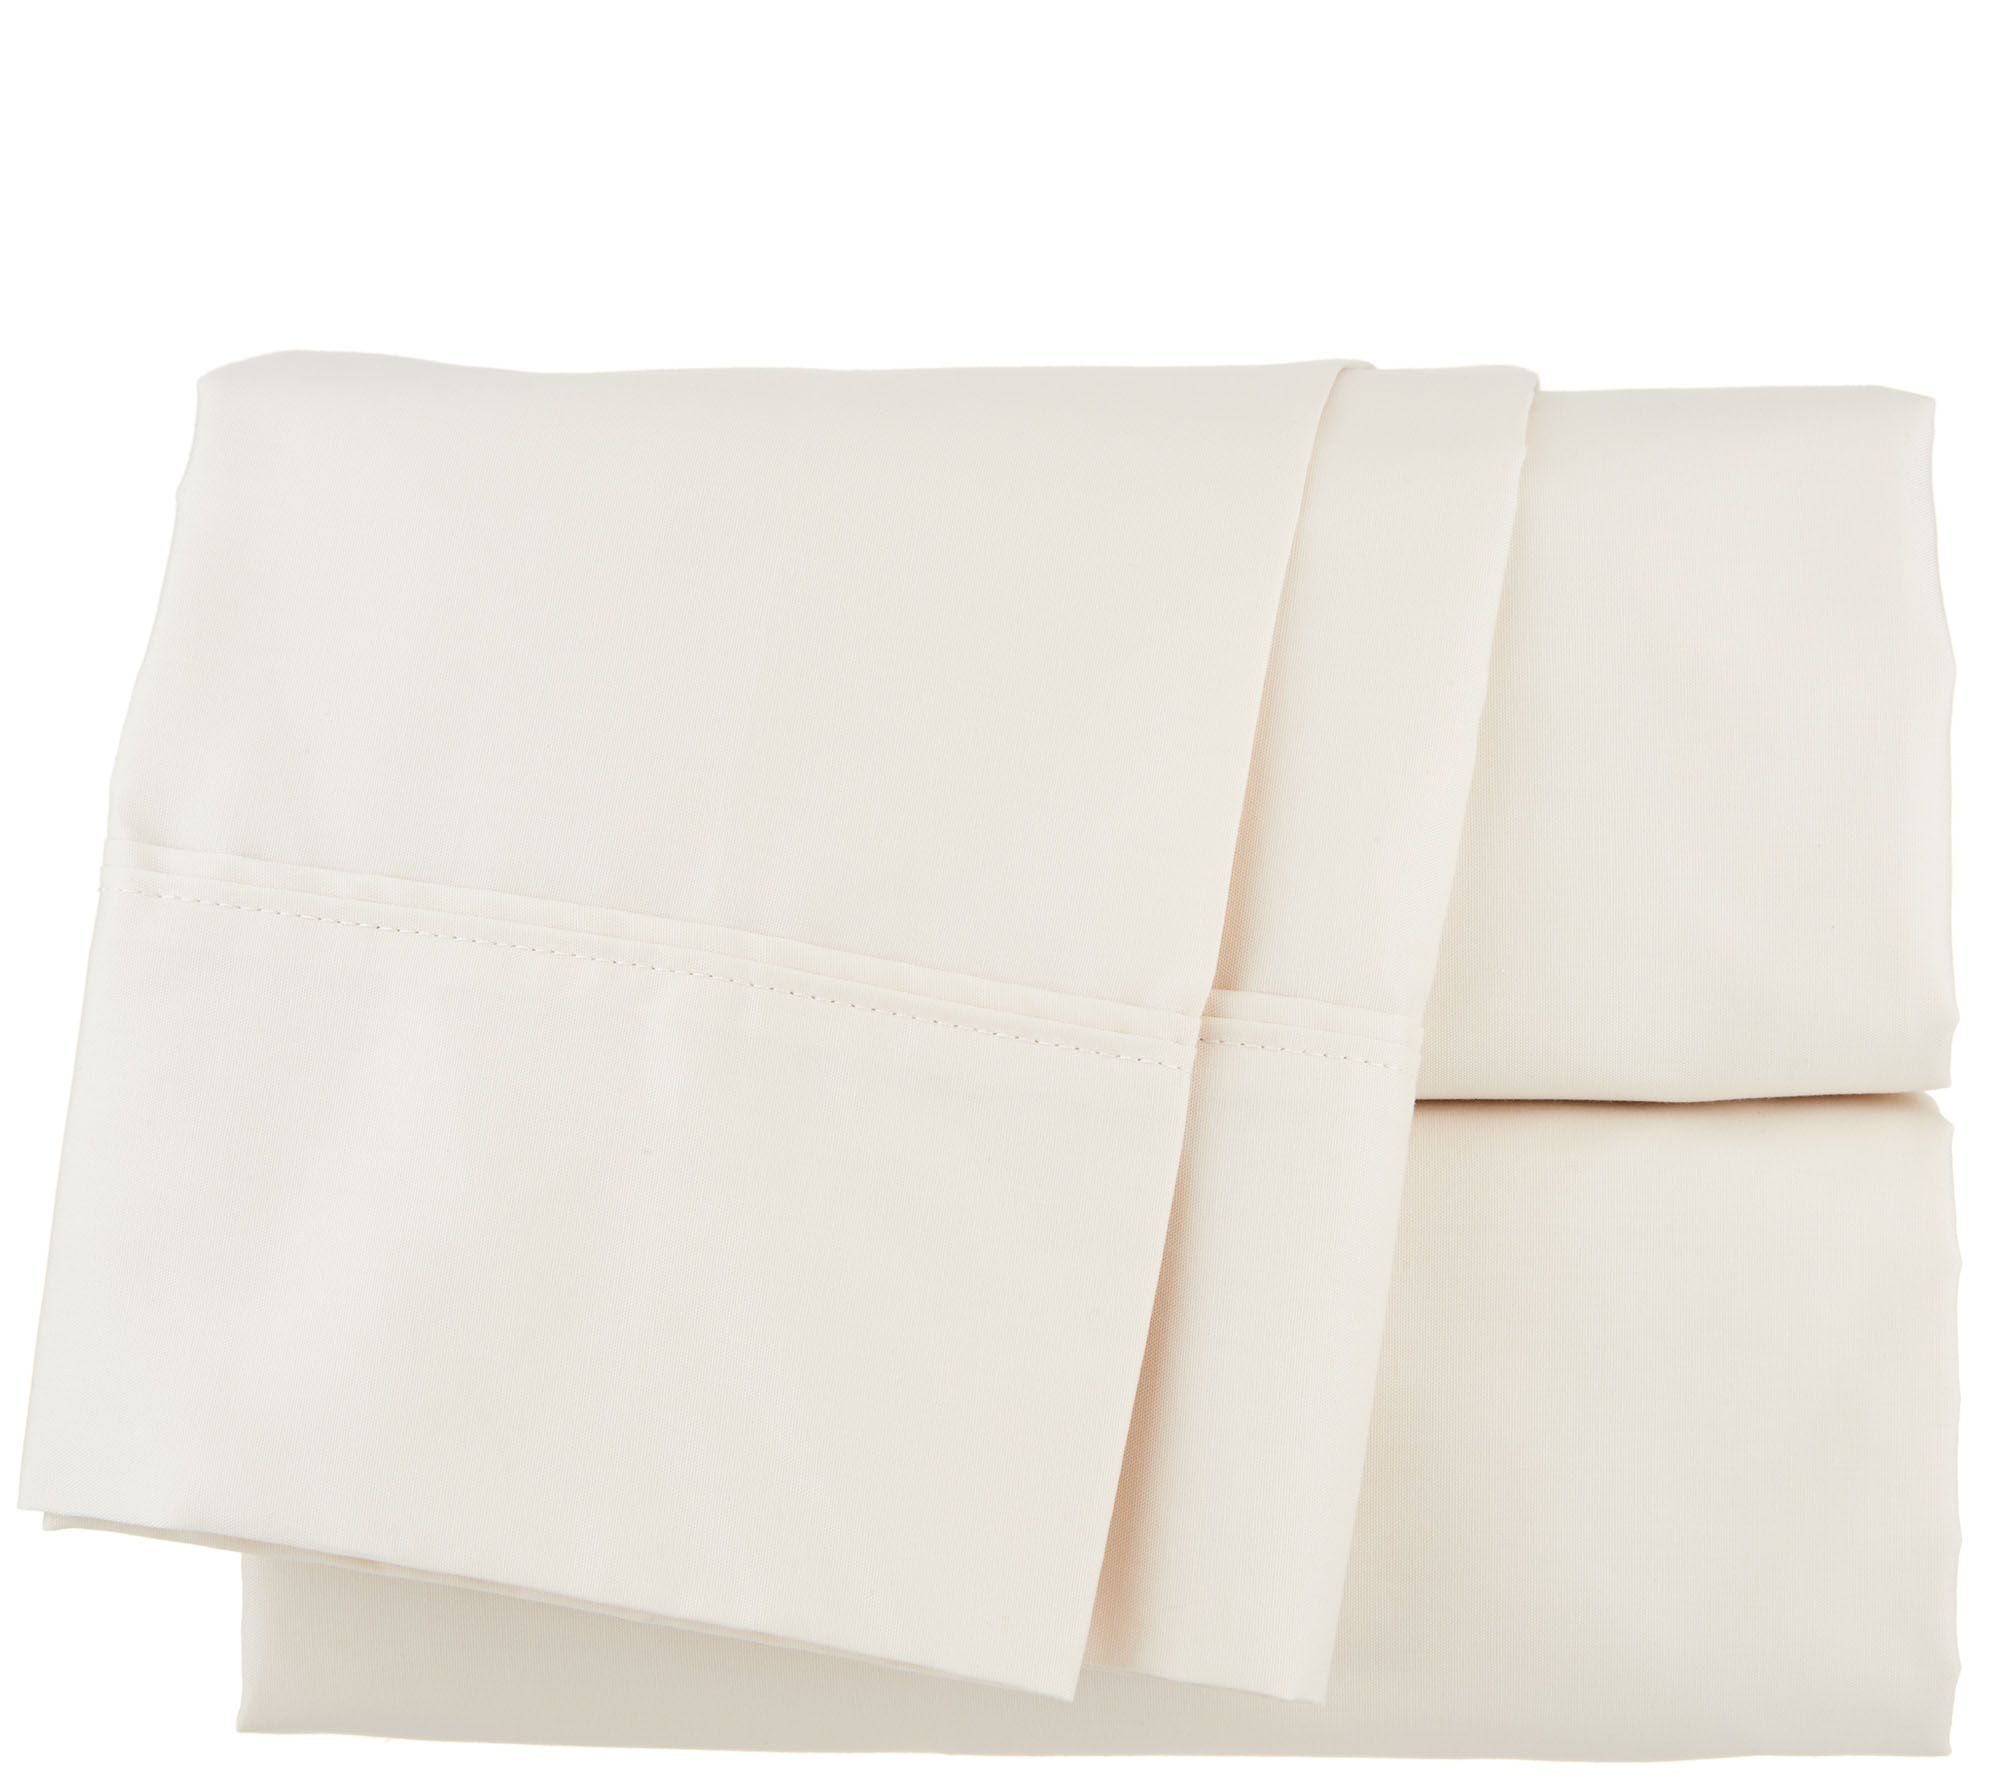 sleep number flextop king sheet set h213142 - Sleep Number Sheets